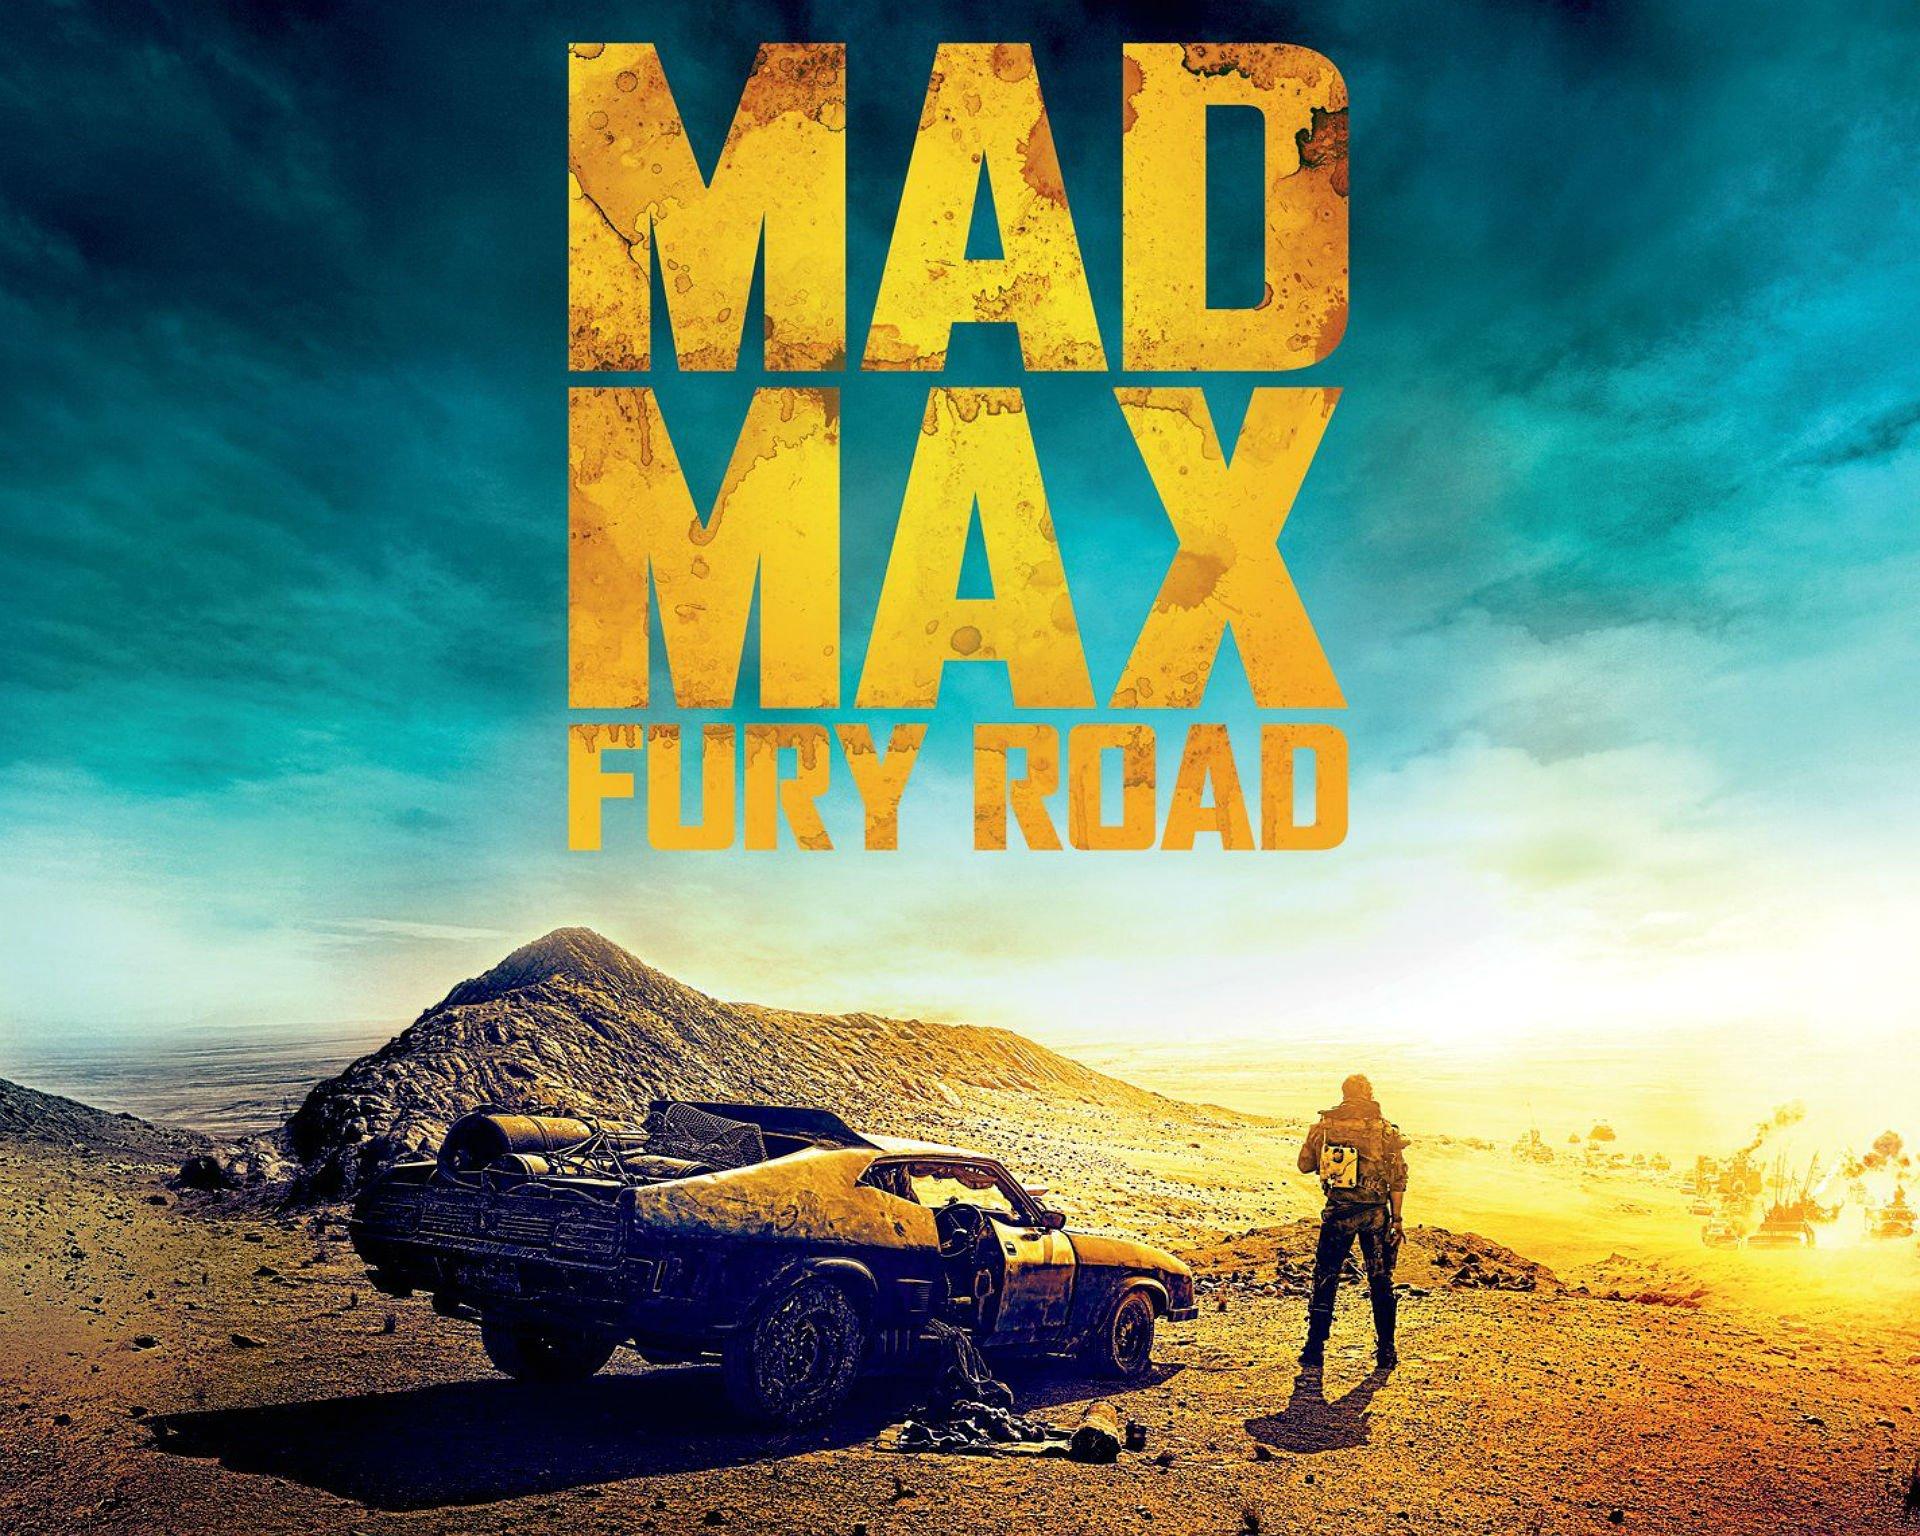 MAD MAX FURY ROAD Sci Fi Futuristic Action Fighting